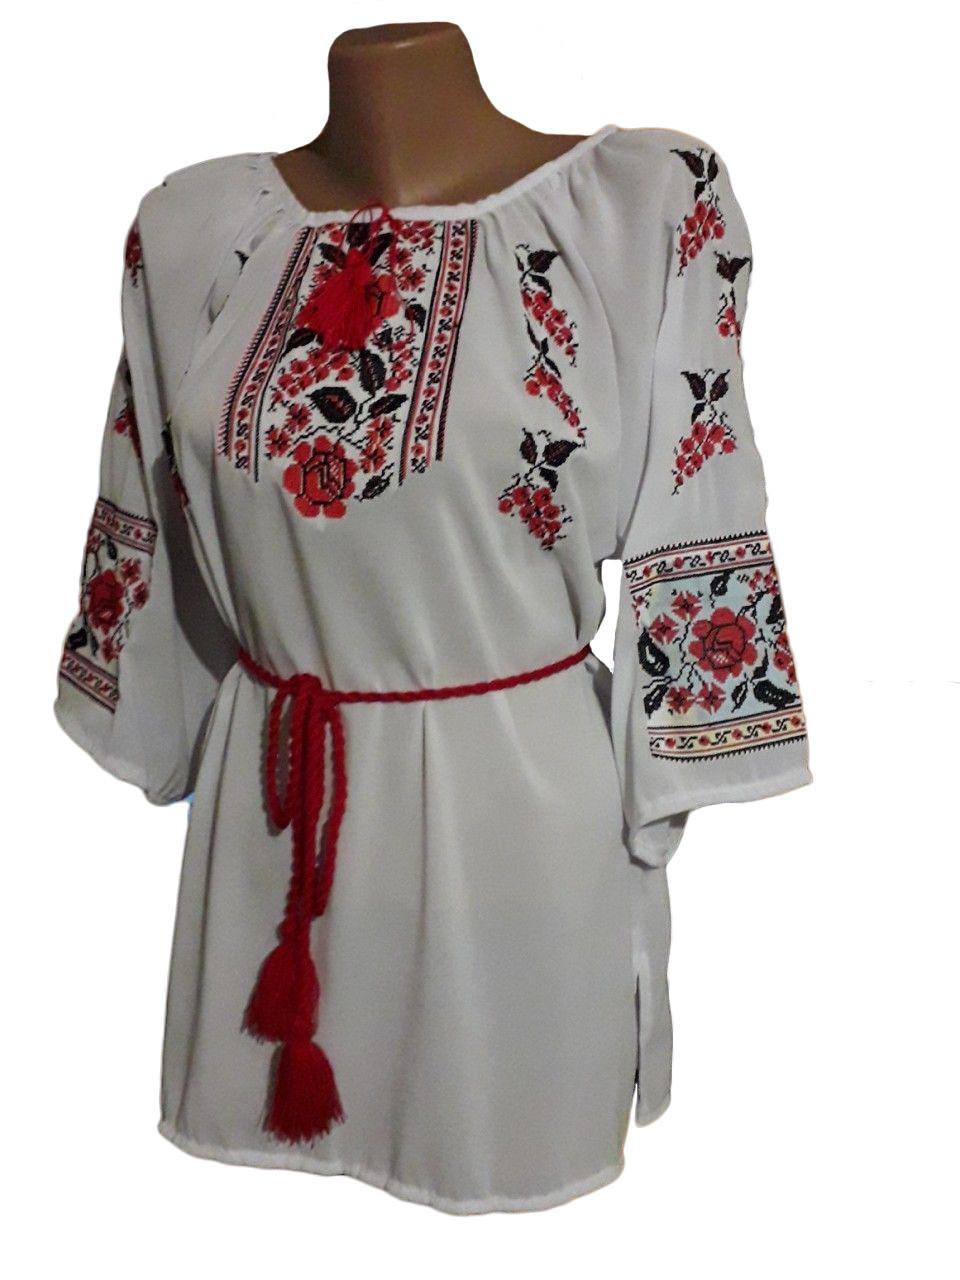 "Жіноча вишита сорочка (блузка) ""Пейгон"" (Женская вышитая рубашка (блузка) ""Пейгон"") BU-0006"